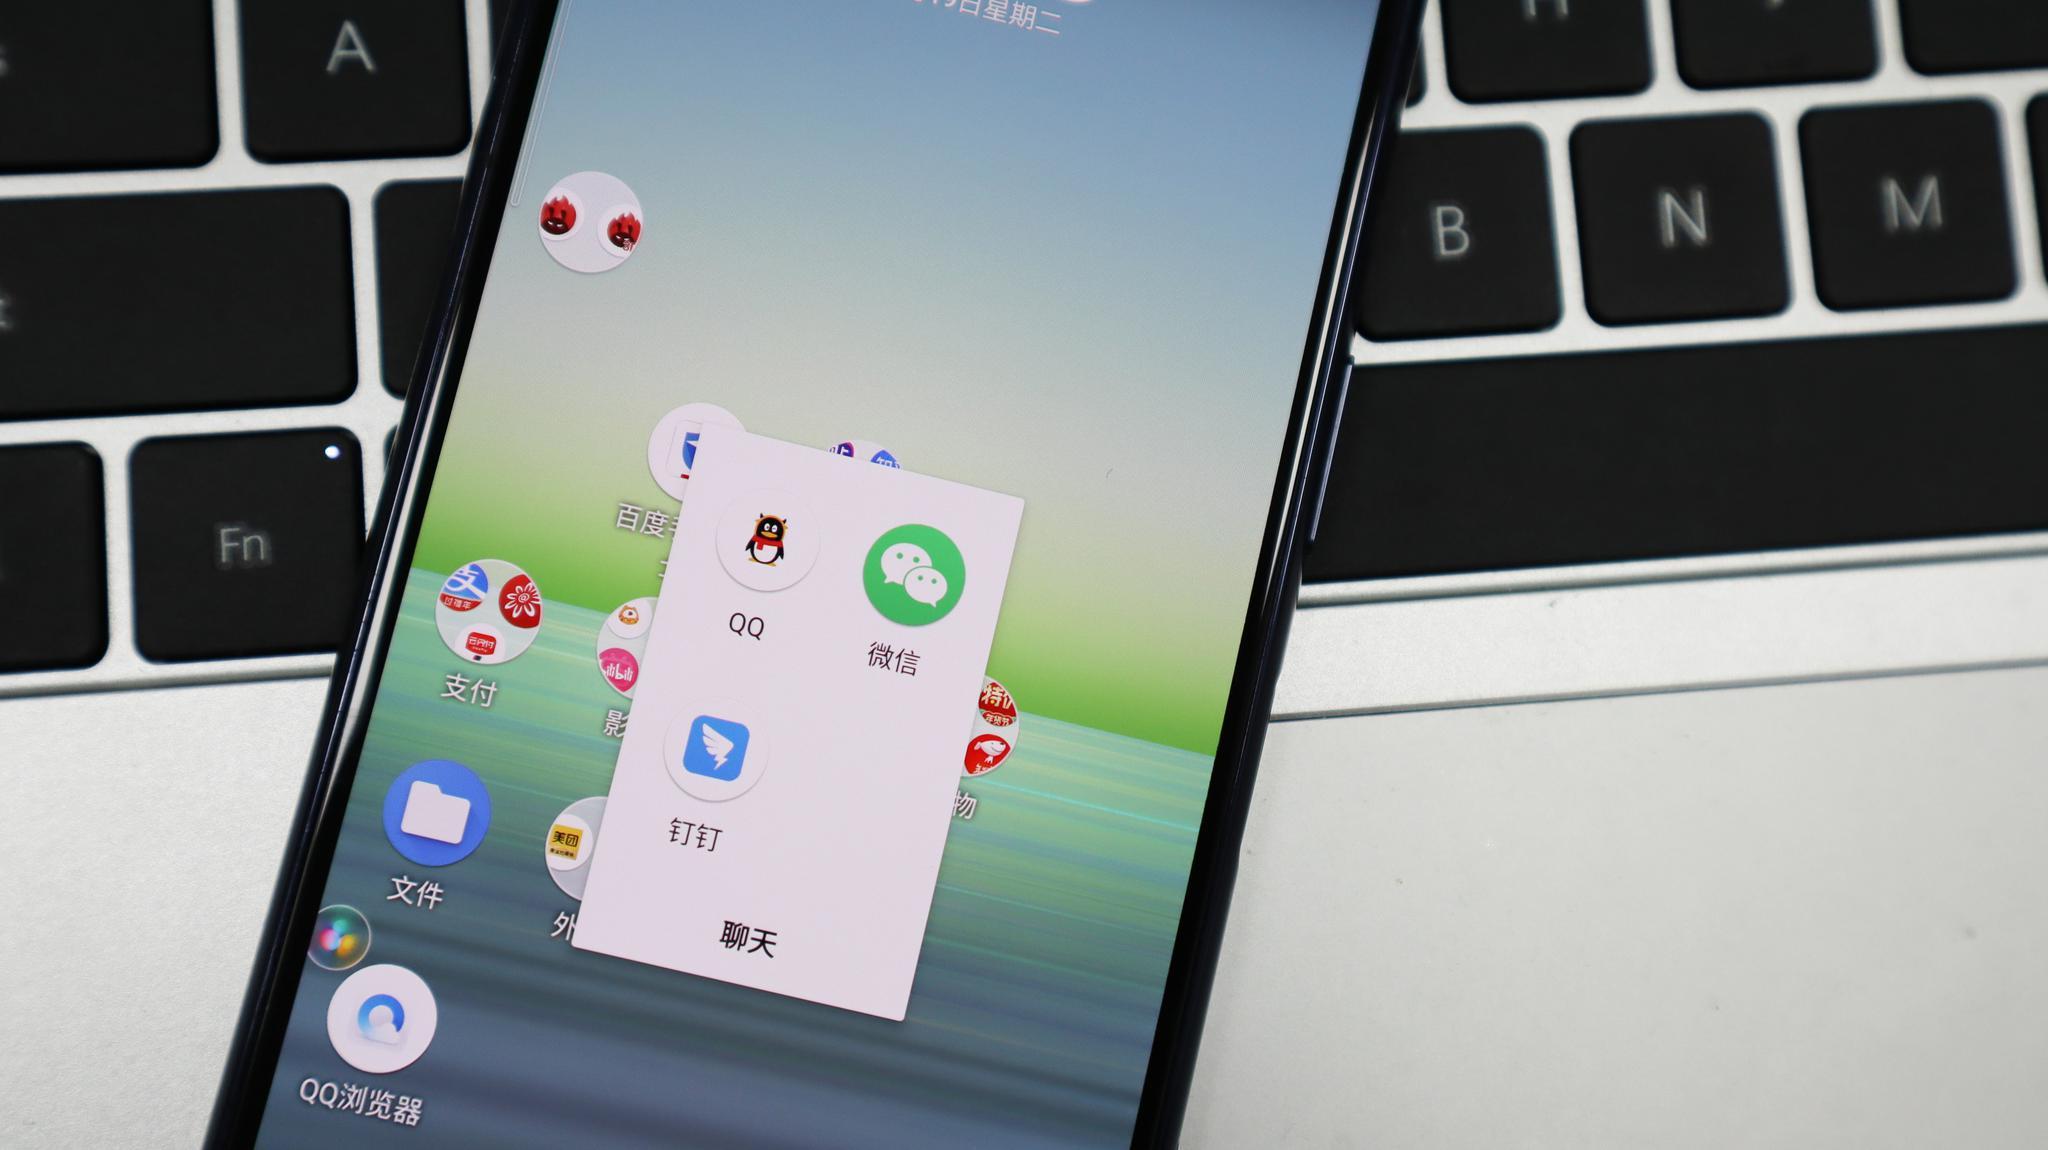 App要被取代了?微信公开课公布小程序数据,每天有4亿人用